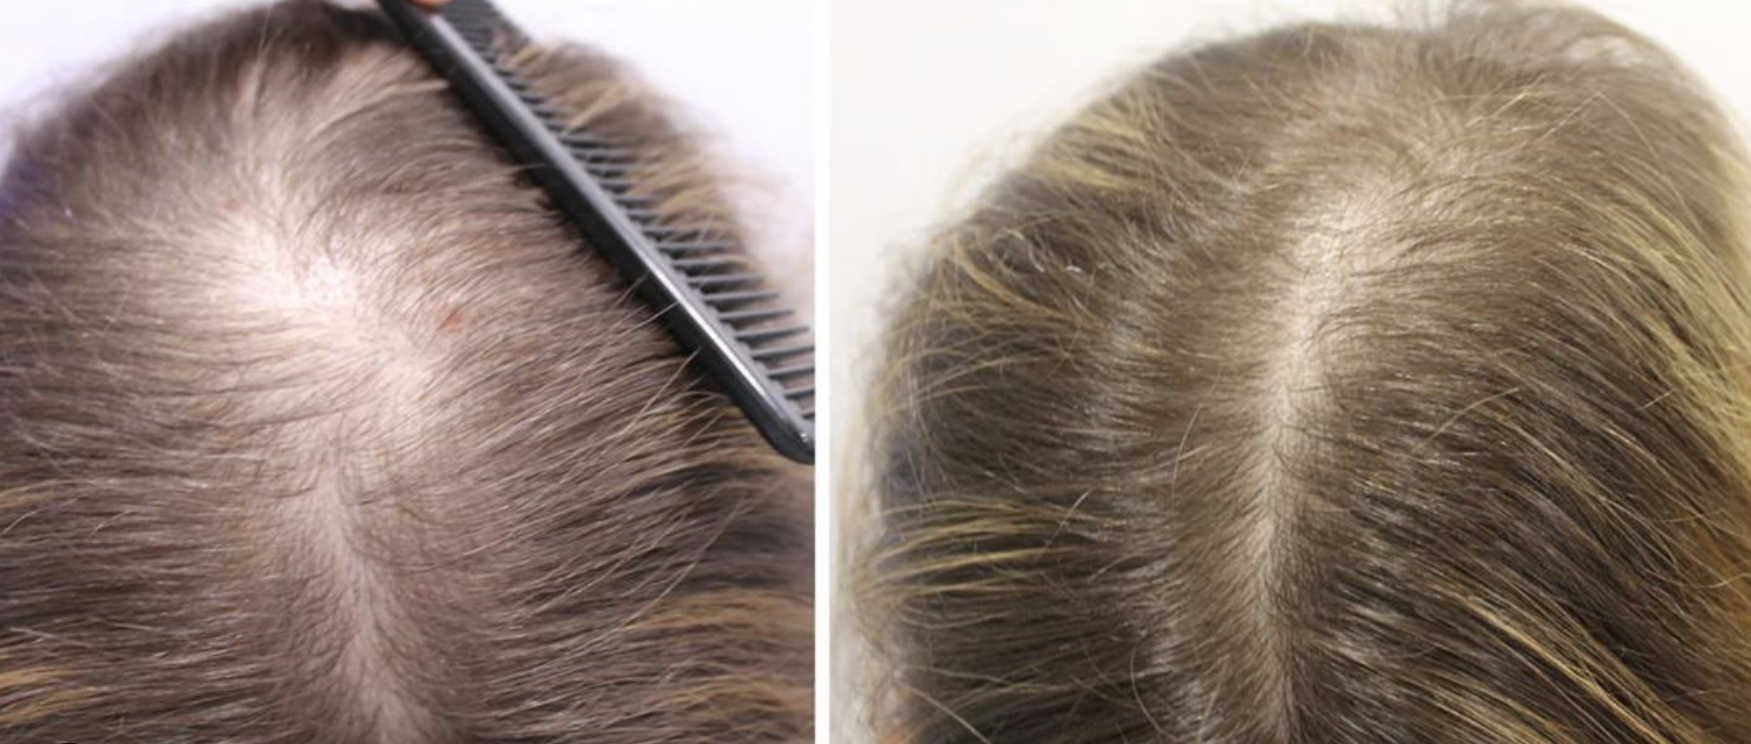 Doctor David Saceda Dermatologo Tricologo Alopecia Trasplante De Pelo Madrid Clinica Grupo Pedro Jaen Blog Noticias Tratamiento Alopecia Femenina Mujer Masculina Hombre Solucion Calvicie Madrid